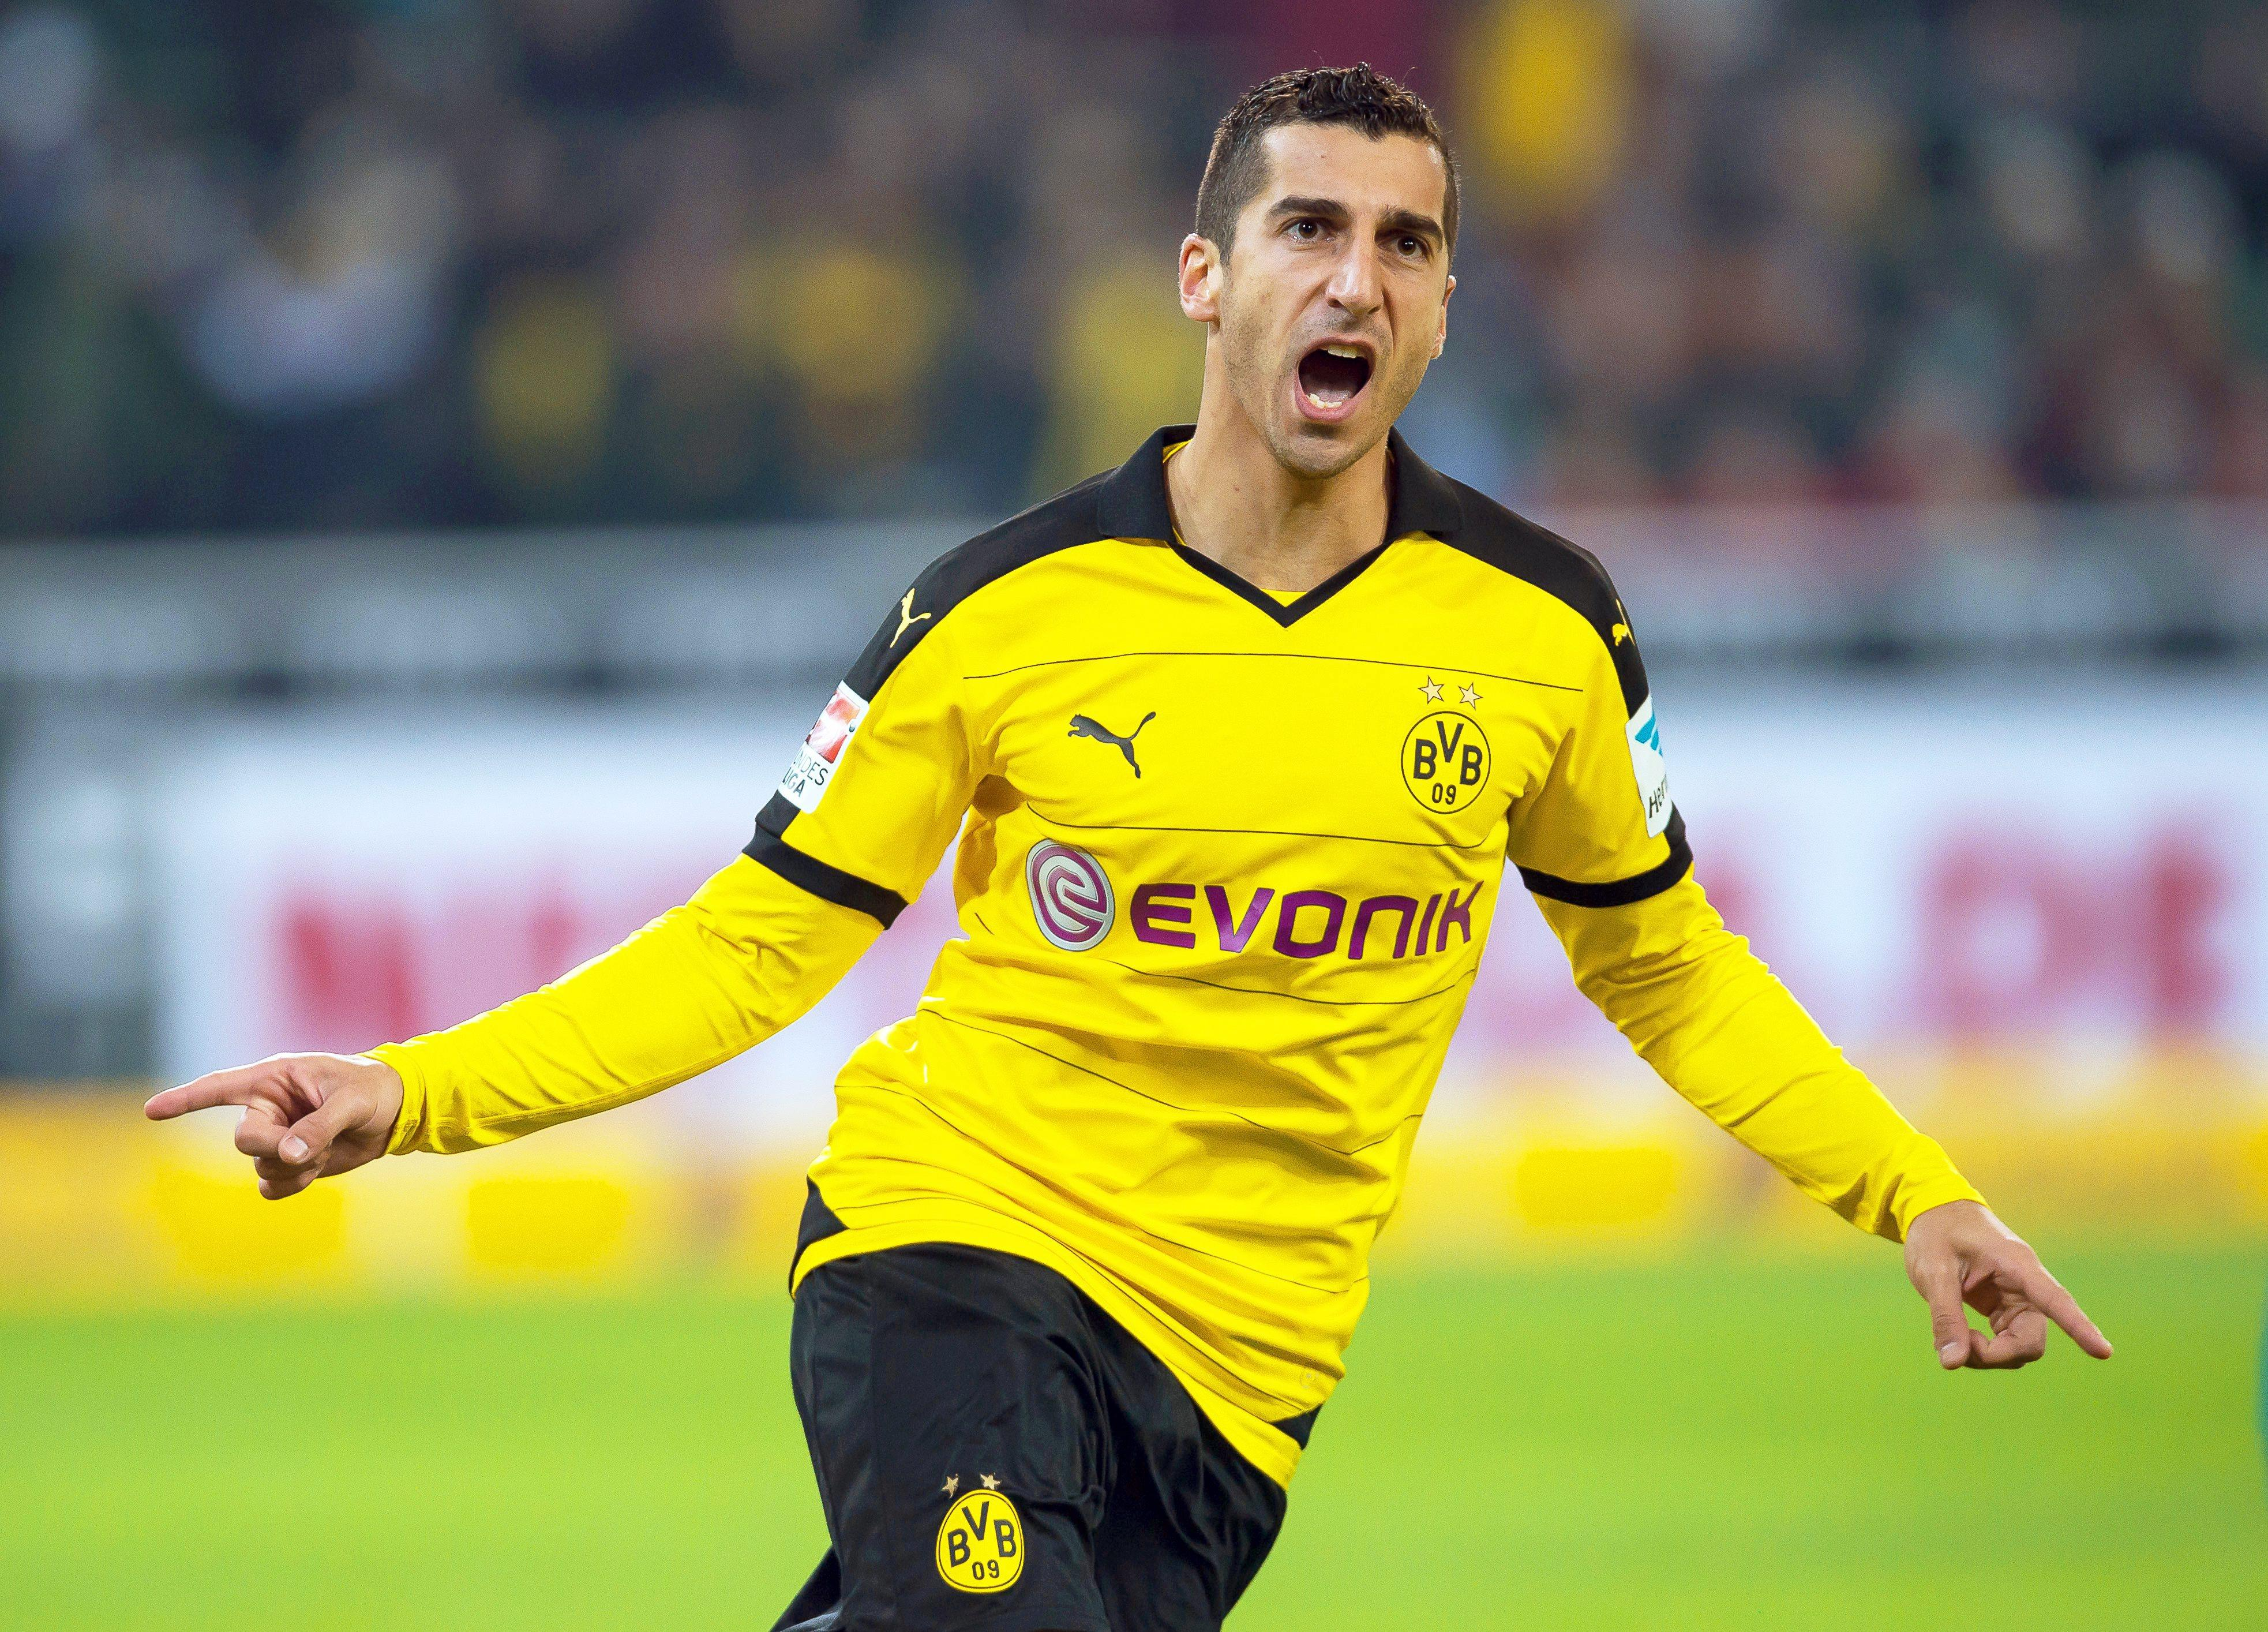 Dortmund still managed a 3-1 without their talisman